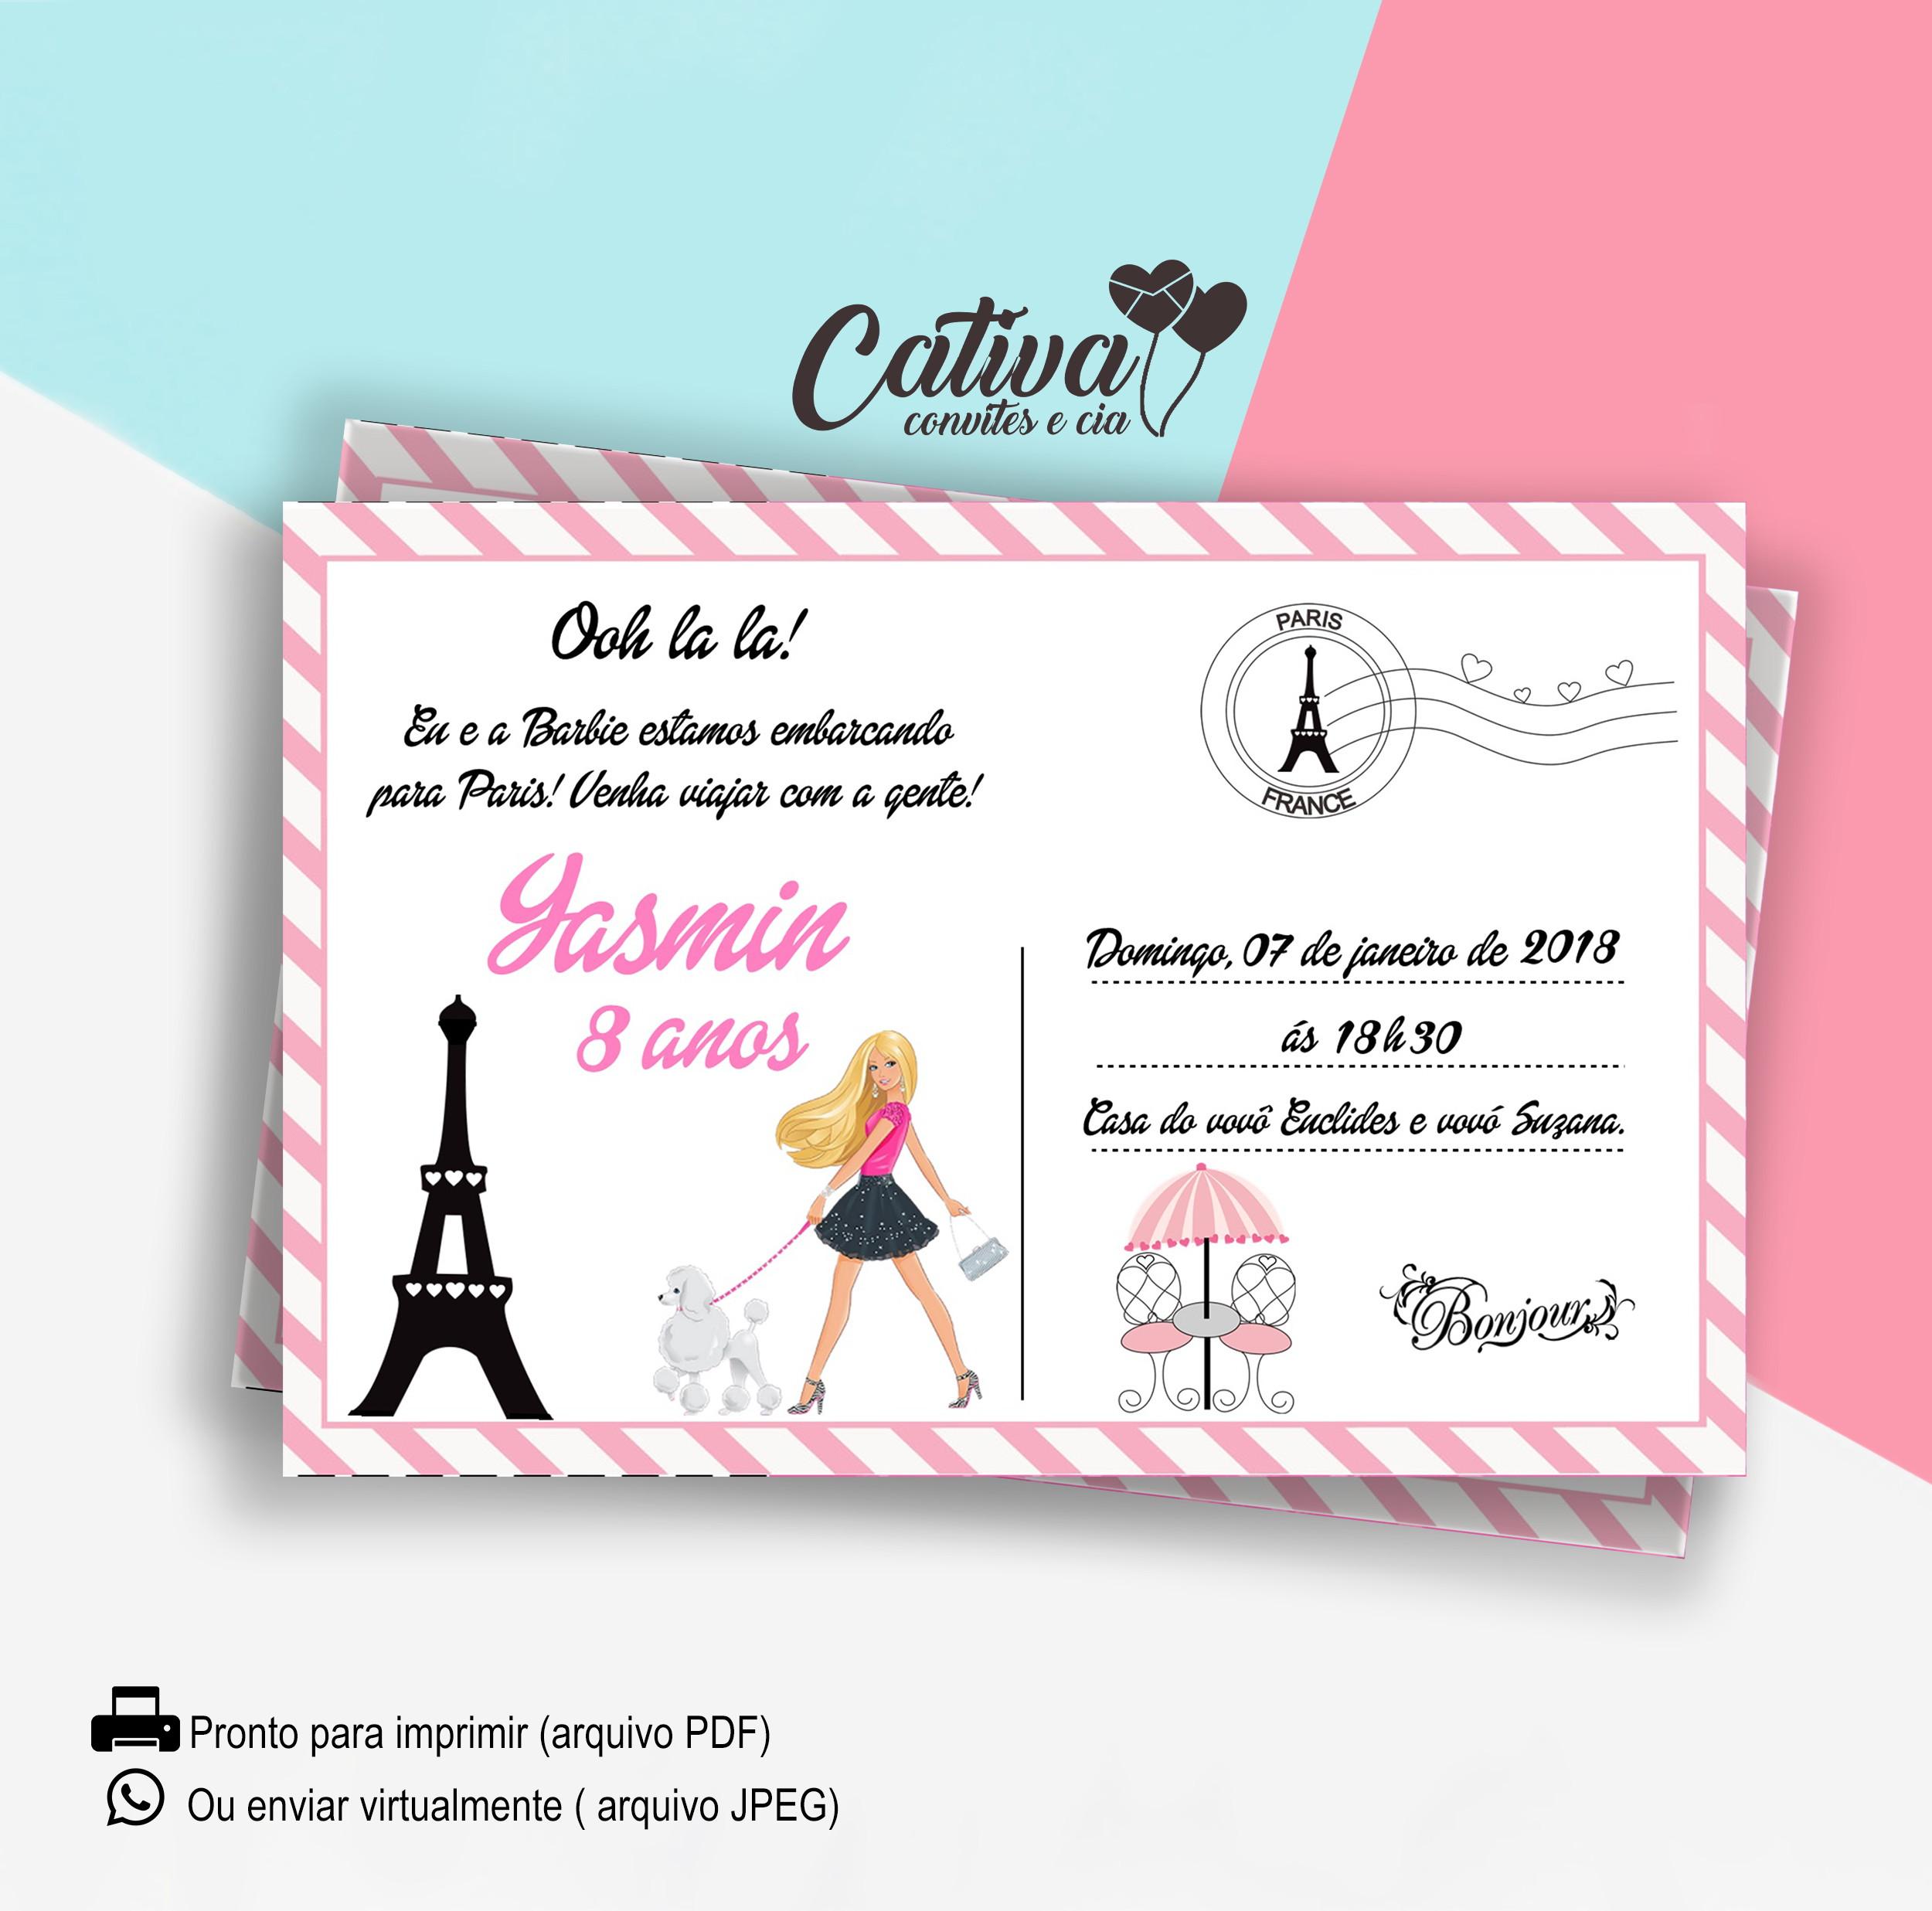 Convite Digital Barbie Paris No Elo7 Cativa Convites E Cia E9f321